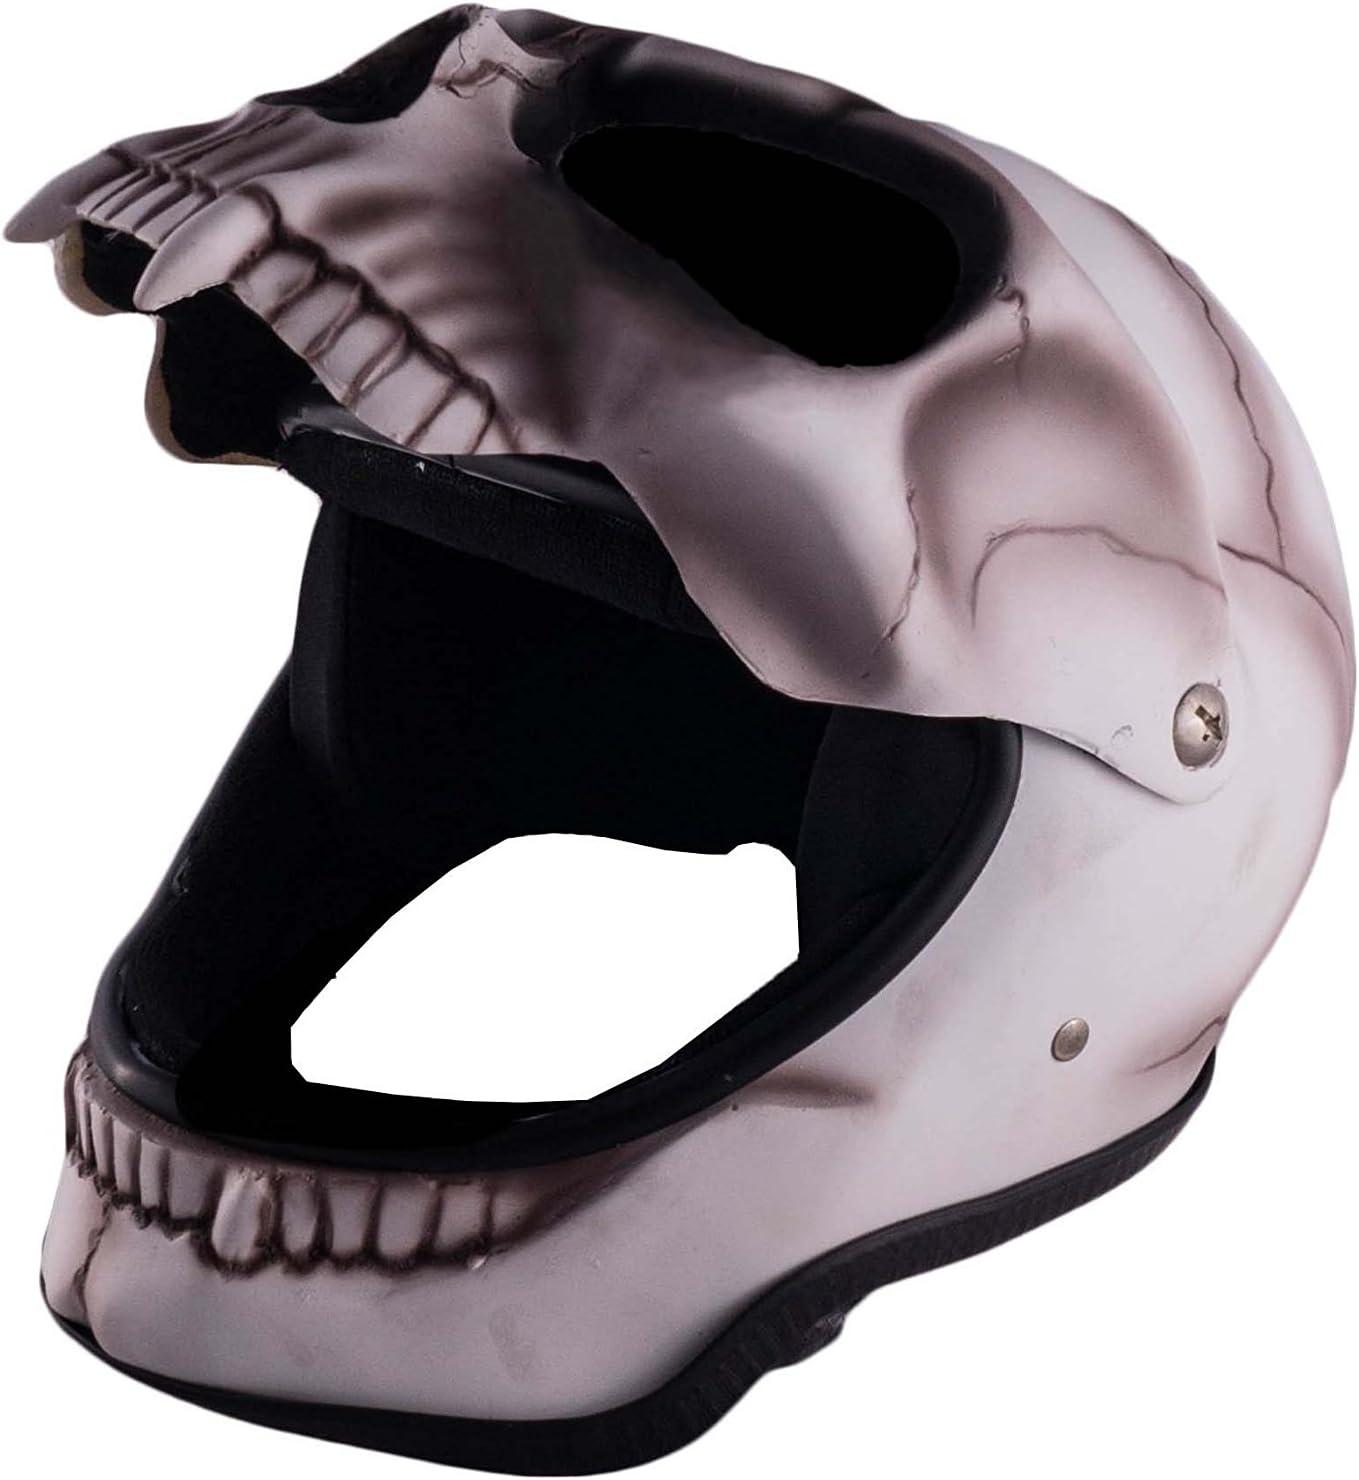 Unbekannt Casque Deko Casque Skull nicht Fun T/ête de mort Casque Skullhead gru/ß elig